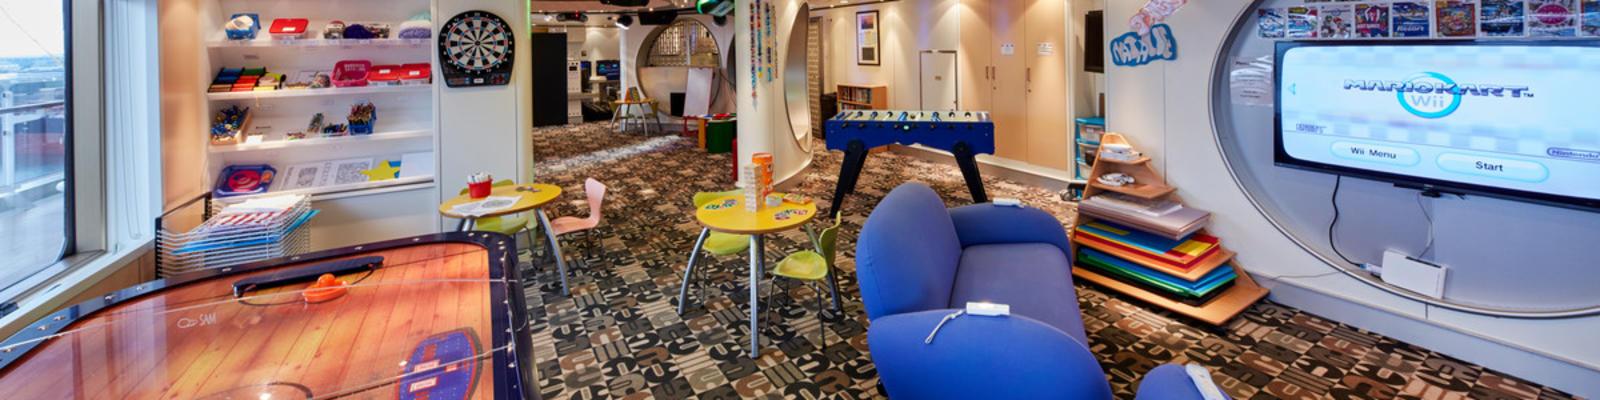 Cunard Kids Clubs on Cunard Cruises (Photo: Cunard)